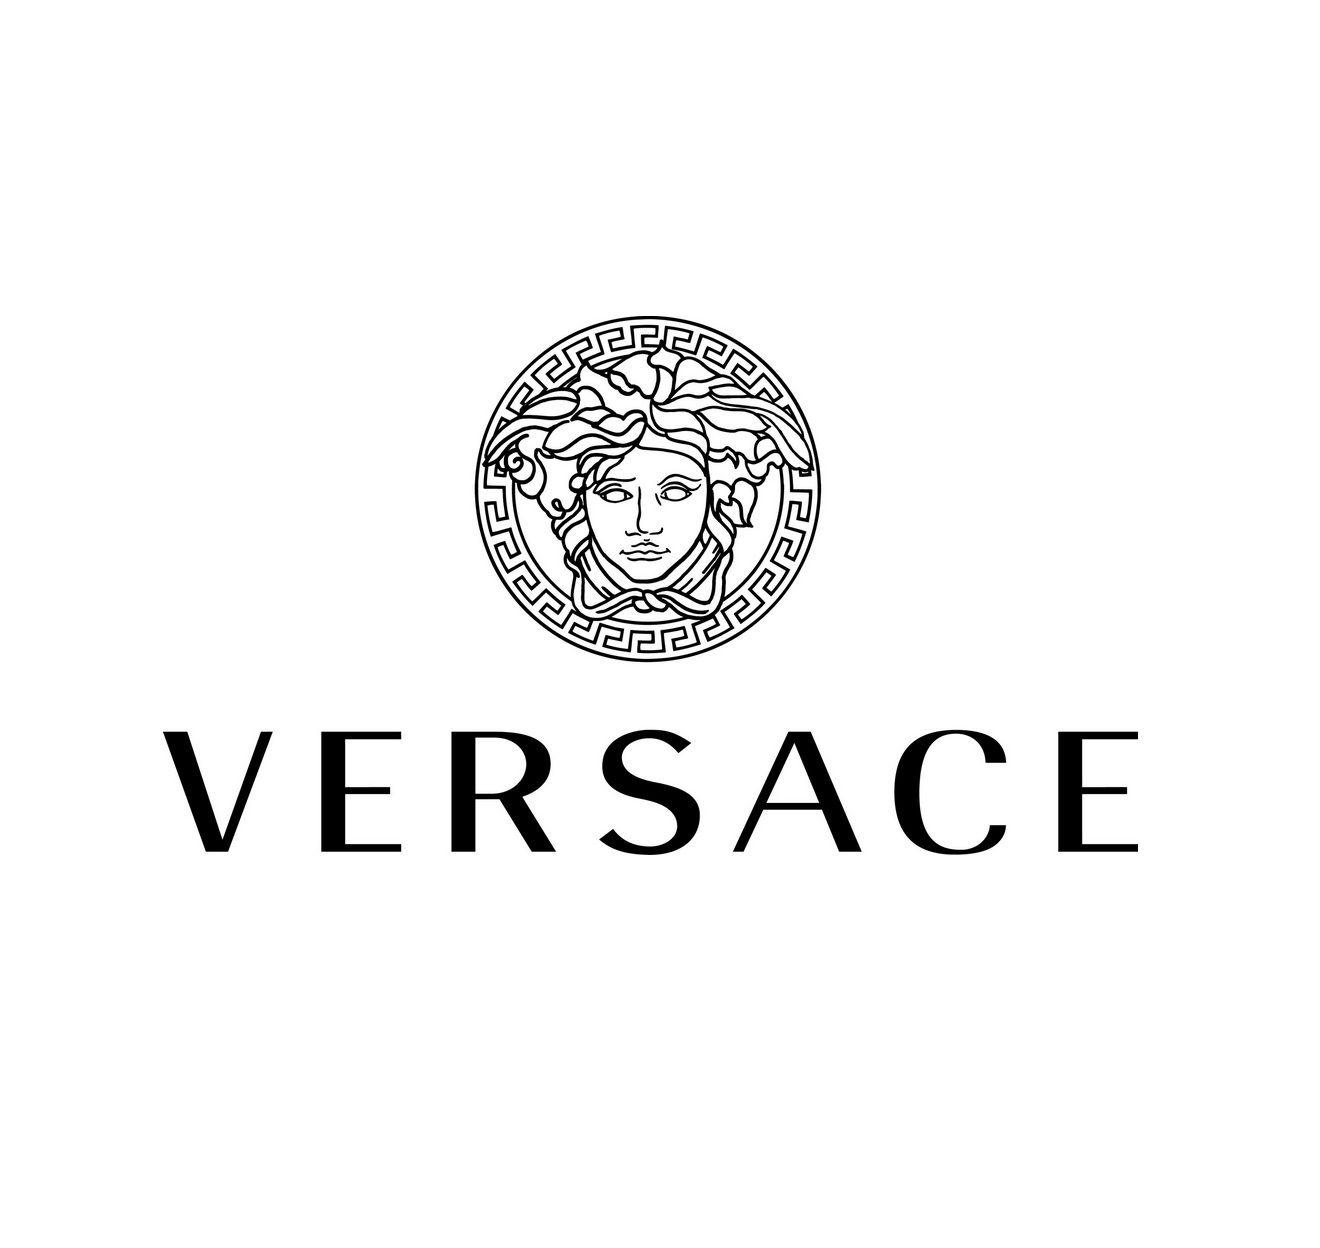 versace logo logos pinterest diy deko bilderrahmen. Black Bedroom Furniture Sets. Home Design Ideas